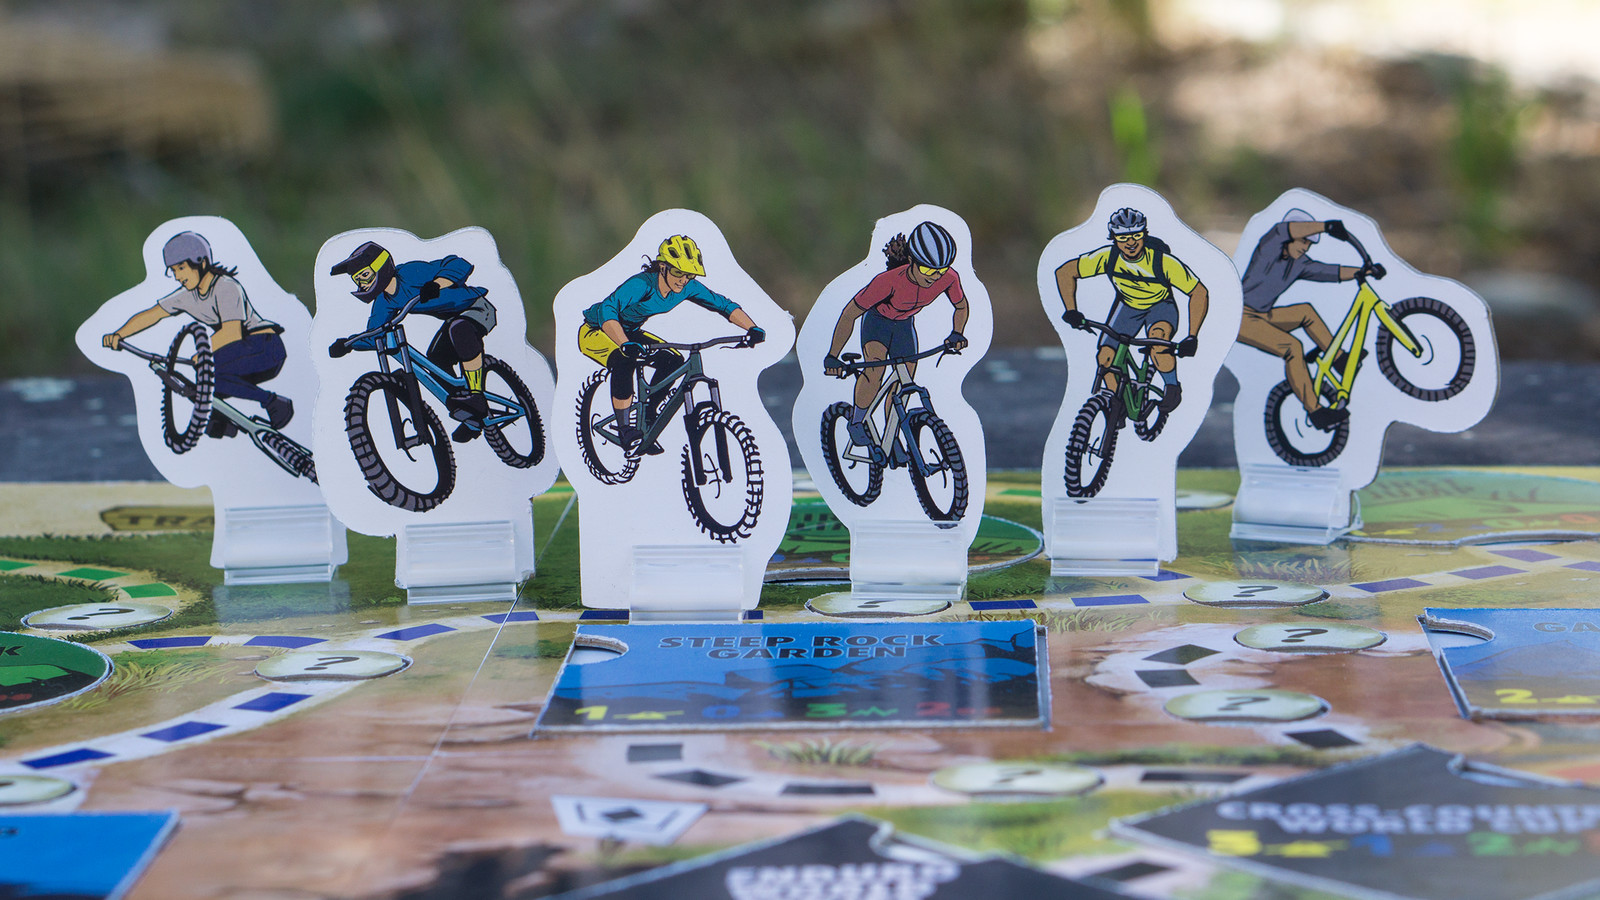 The riders (L to R): Dirt Jump Delilah, Downhill Derek, Enduro Elsa, Cross-Country Carrie, Singletrack Sammy, Trials Terrance